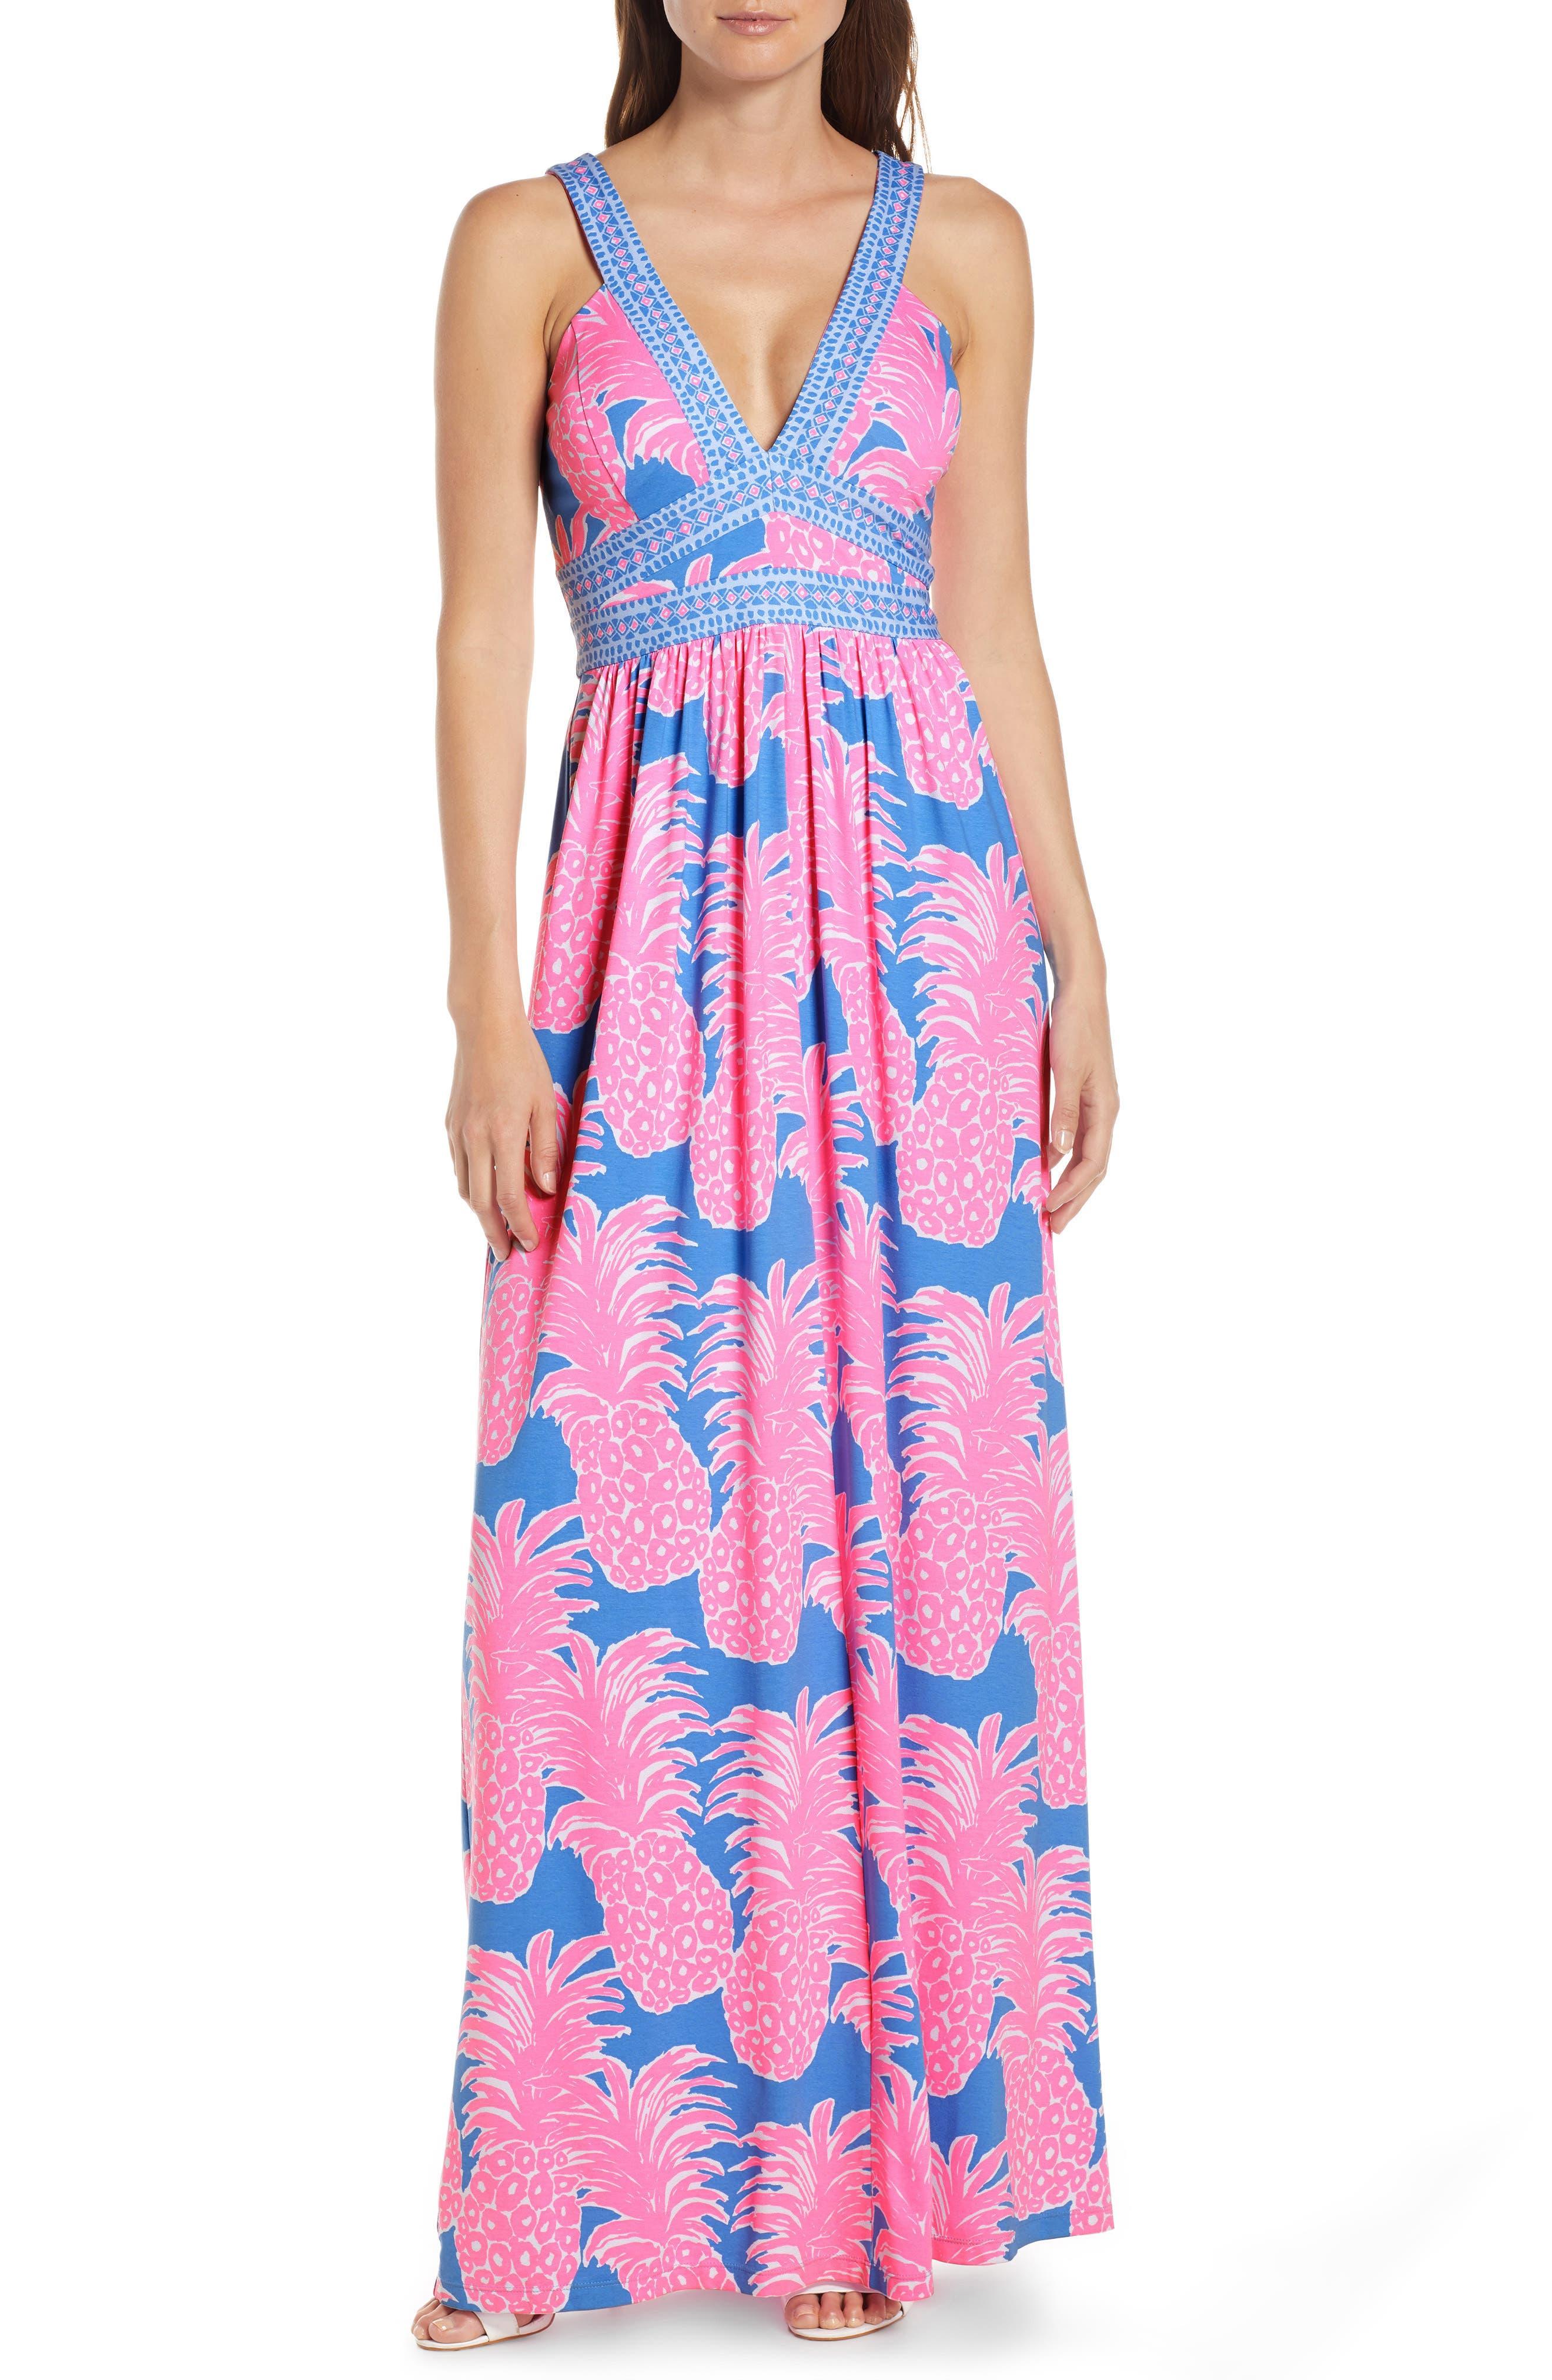 Retro Tiki Dress – Tropical, Hawaiian Dresses Womens Lilly Pulitzer Taryn Print Maxi Dress $198.00 AT vintagedancer.com